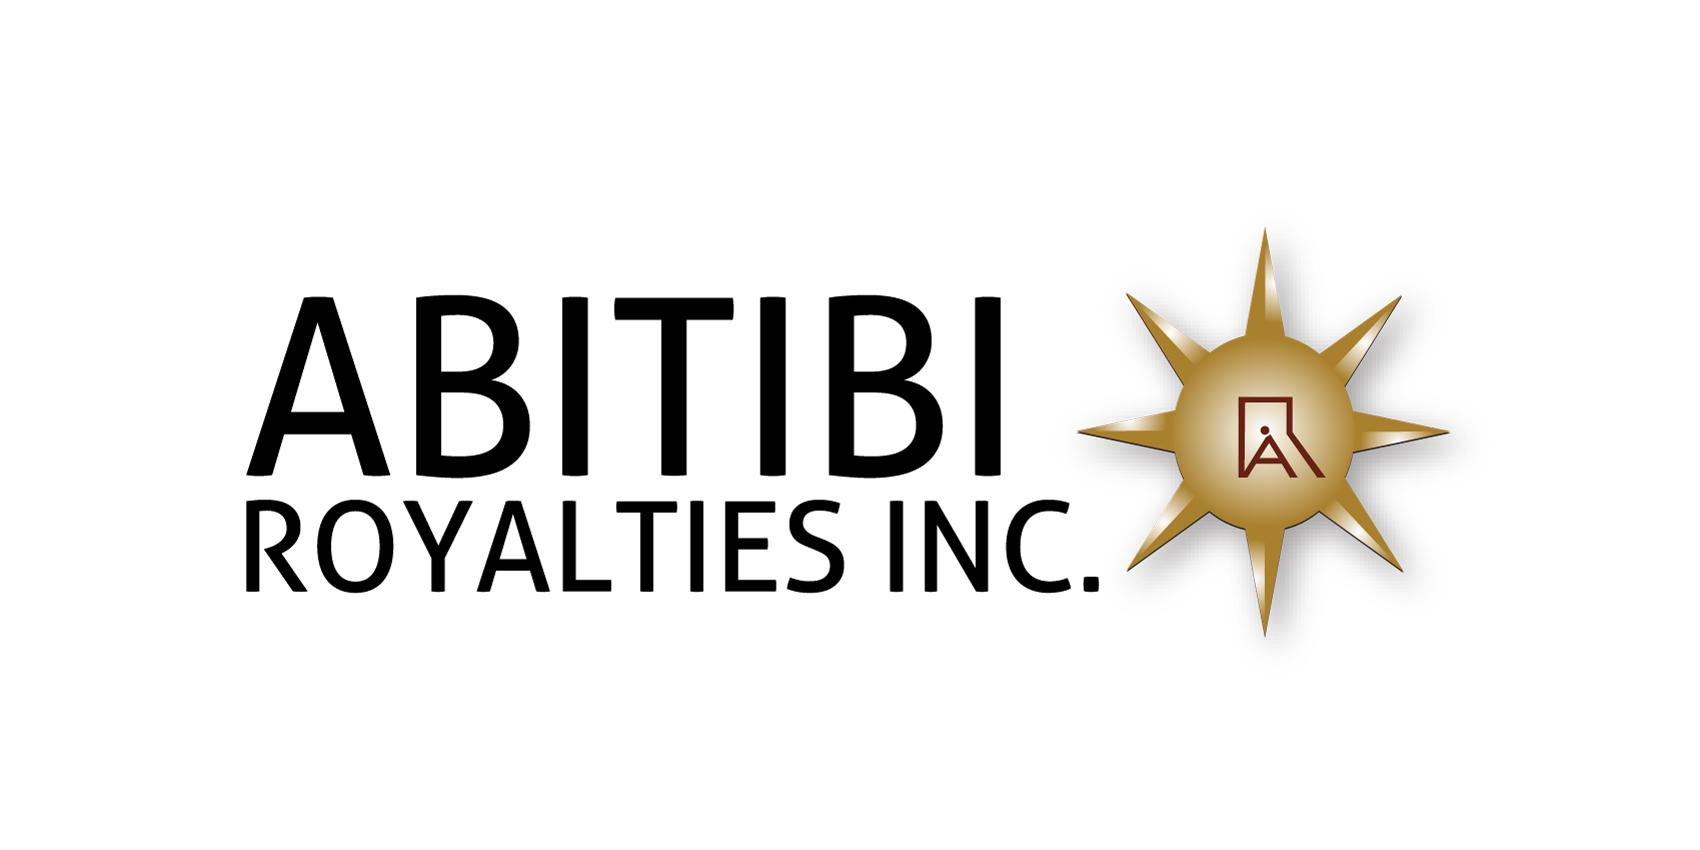 ABITIBI ROYALTIES: Canadian Malartic Mine Royalties 2019 Reserve & Resource Estimates